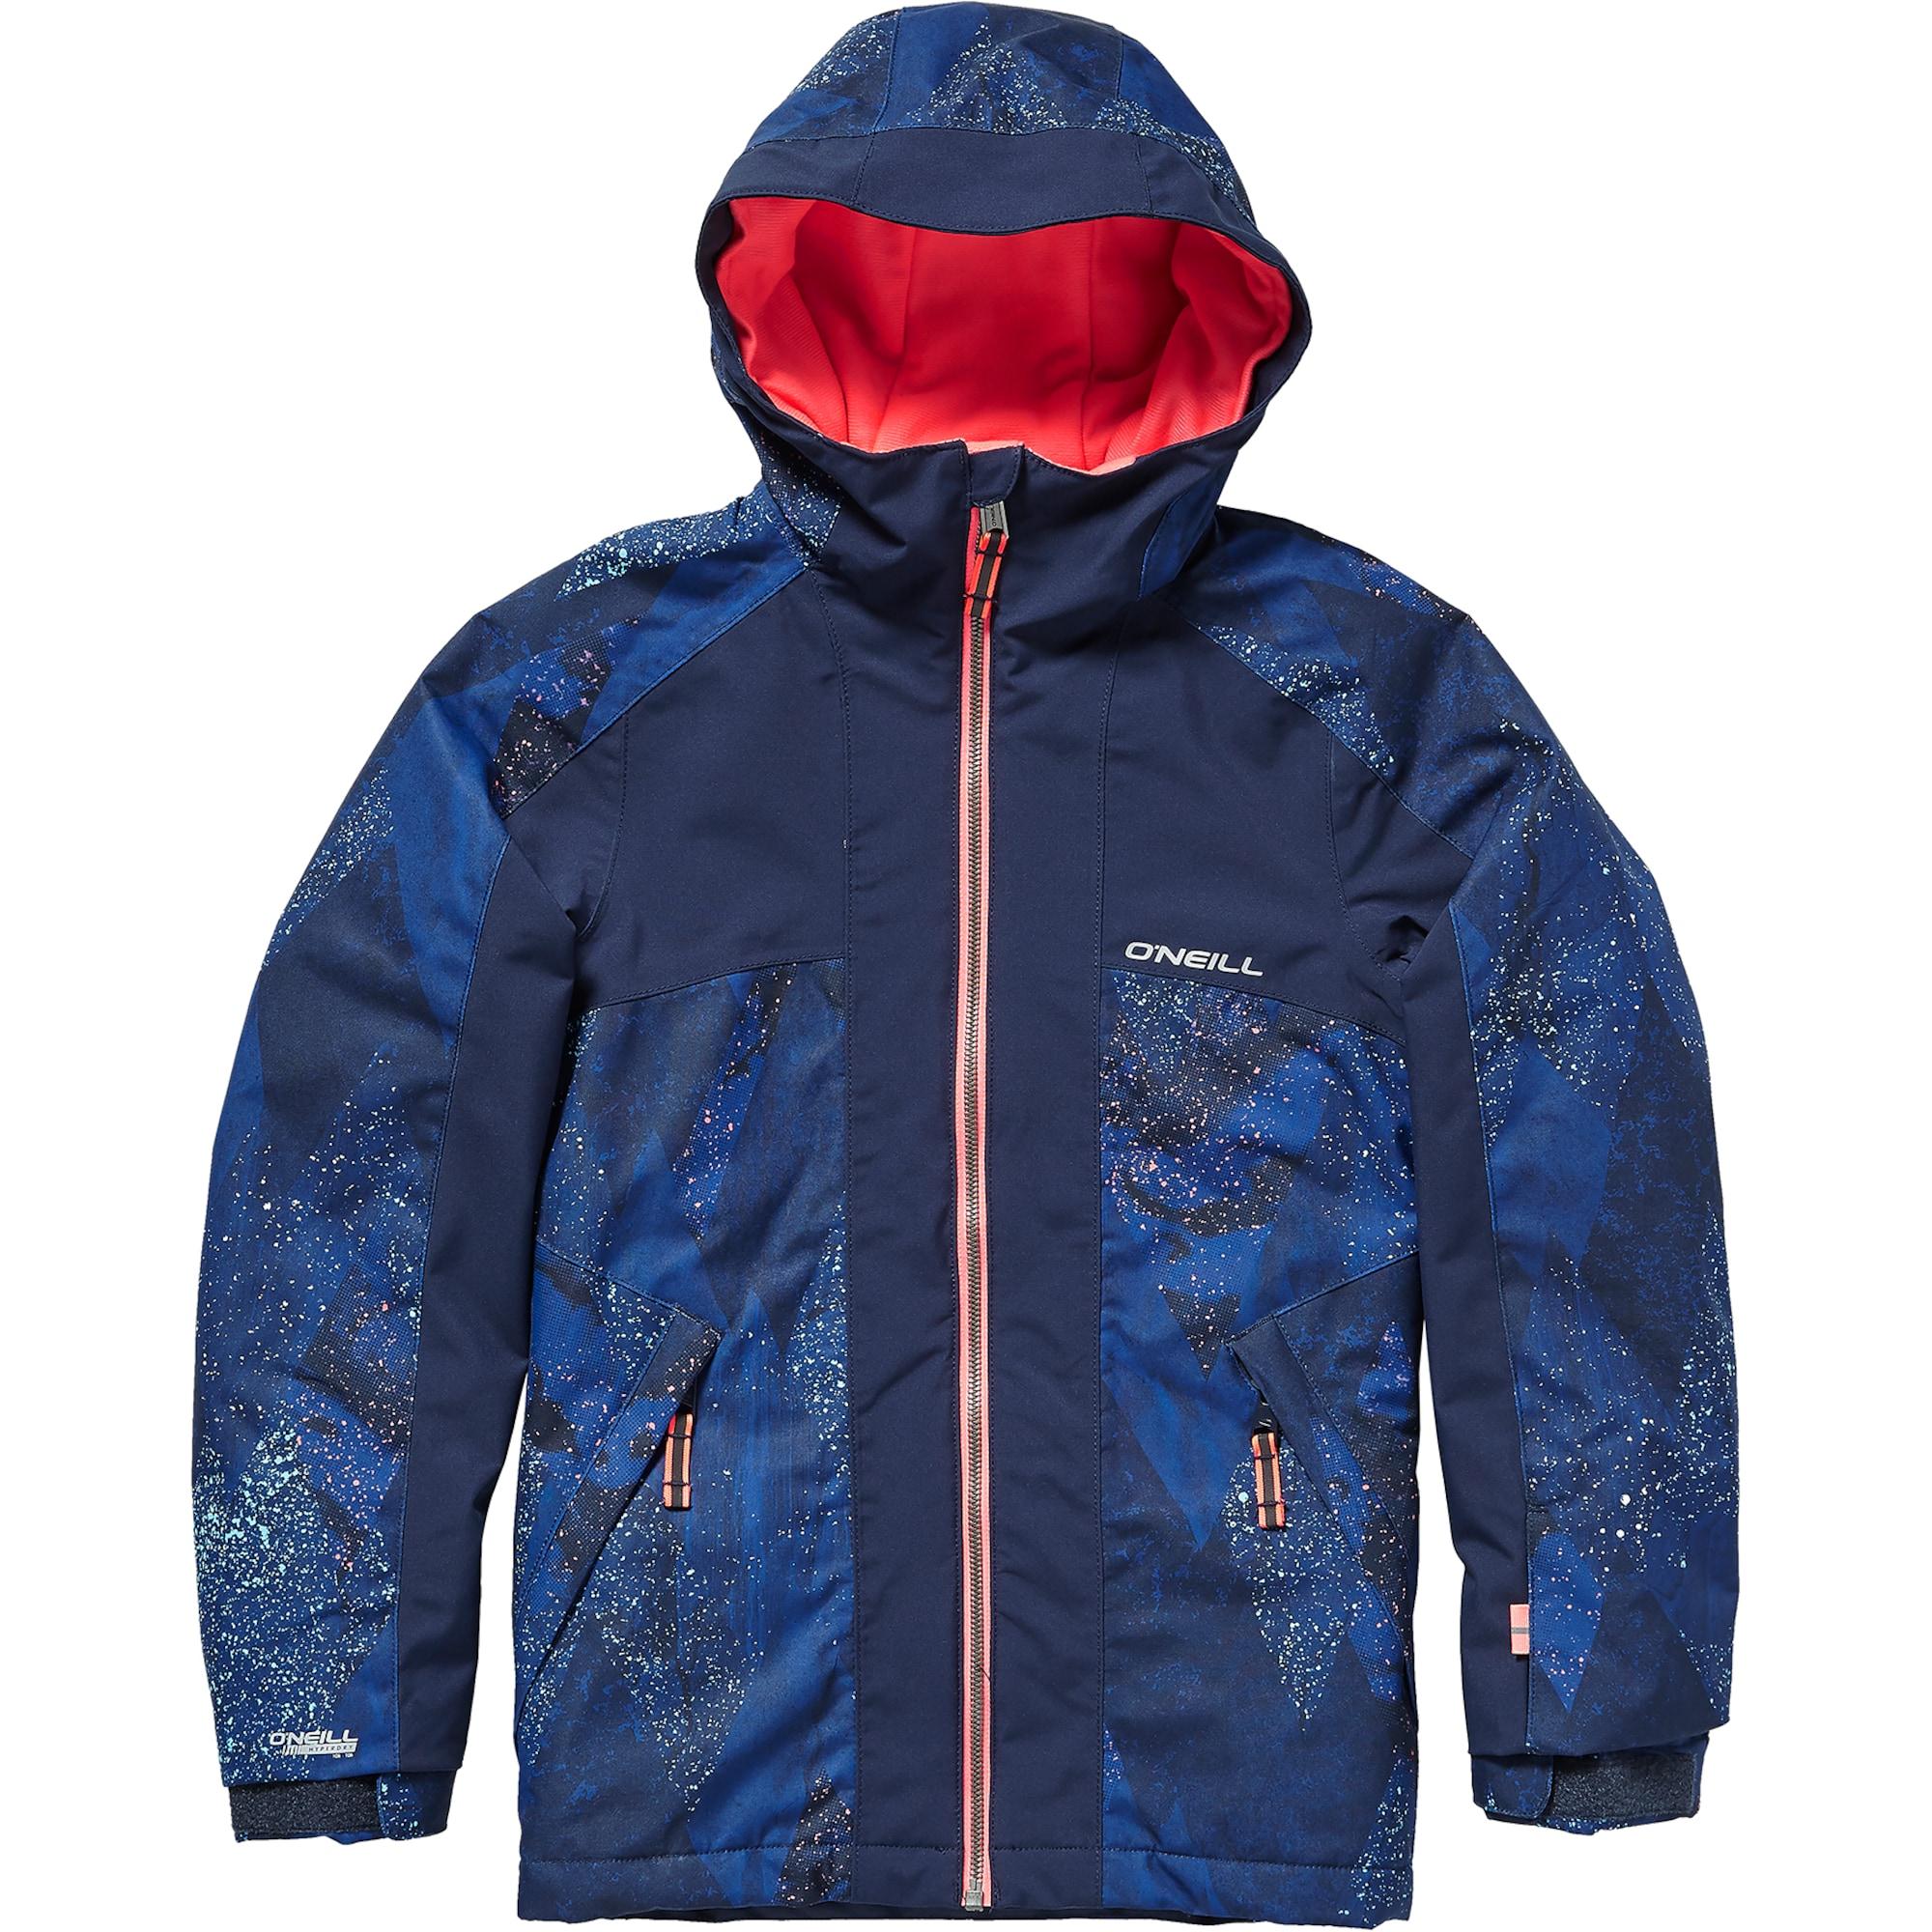 ONEILL Sportovní bunda Allure modrá mix barev O'NEILL